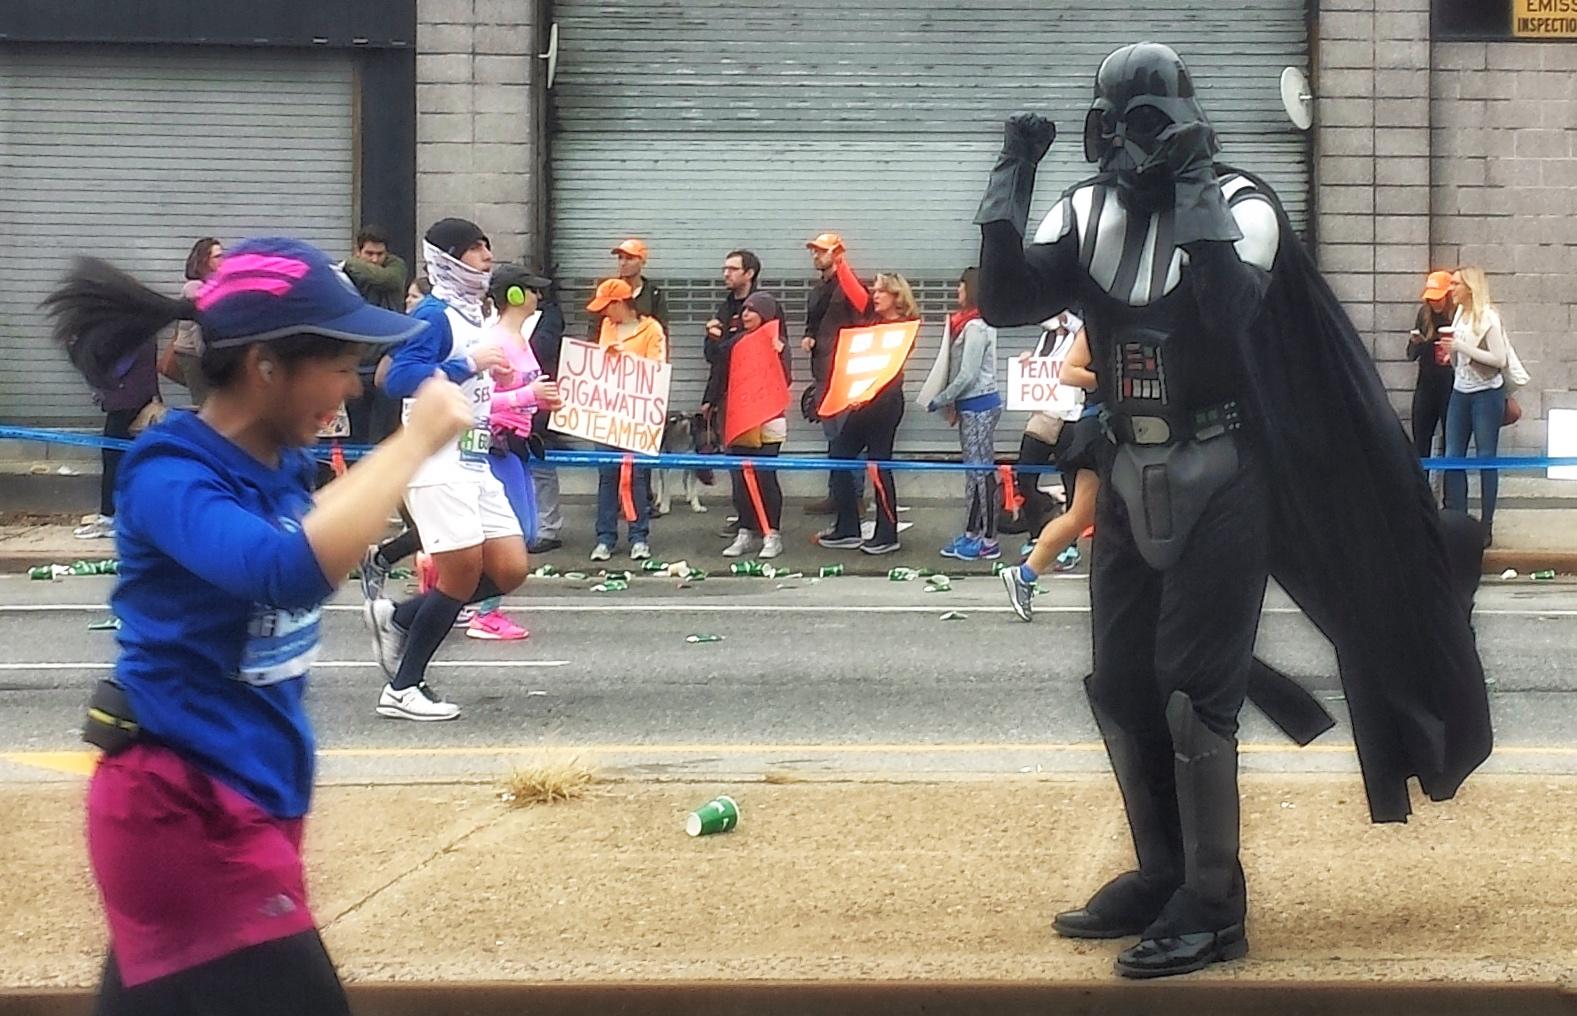 Darth Vader, New York Marathon, Brooklyn